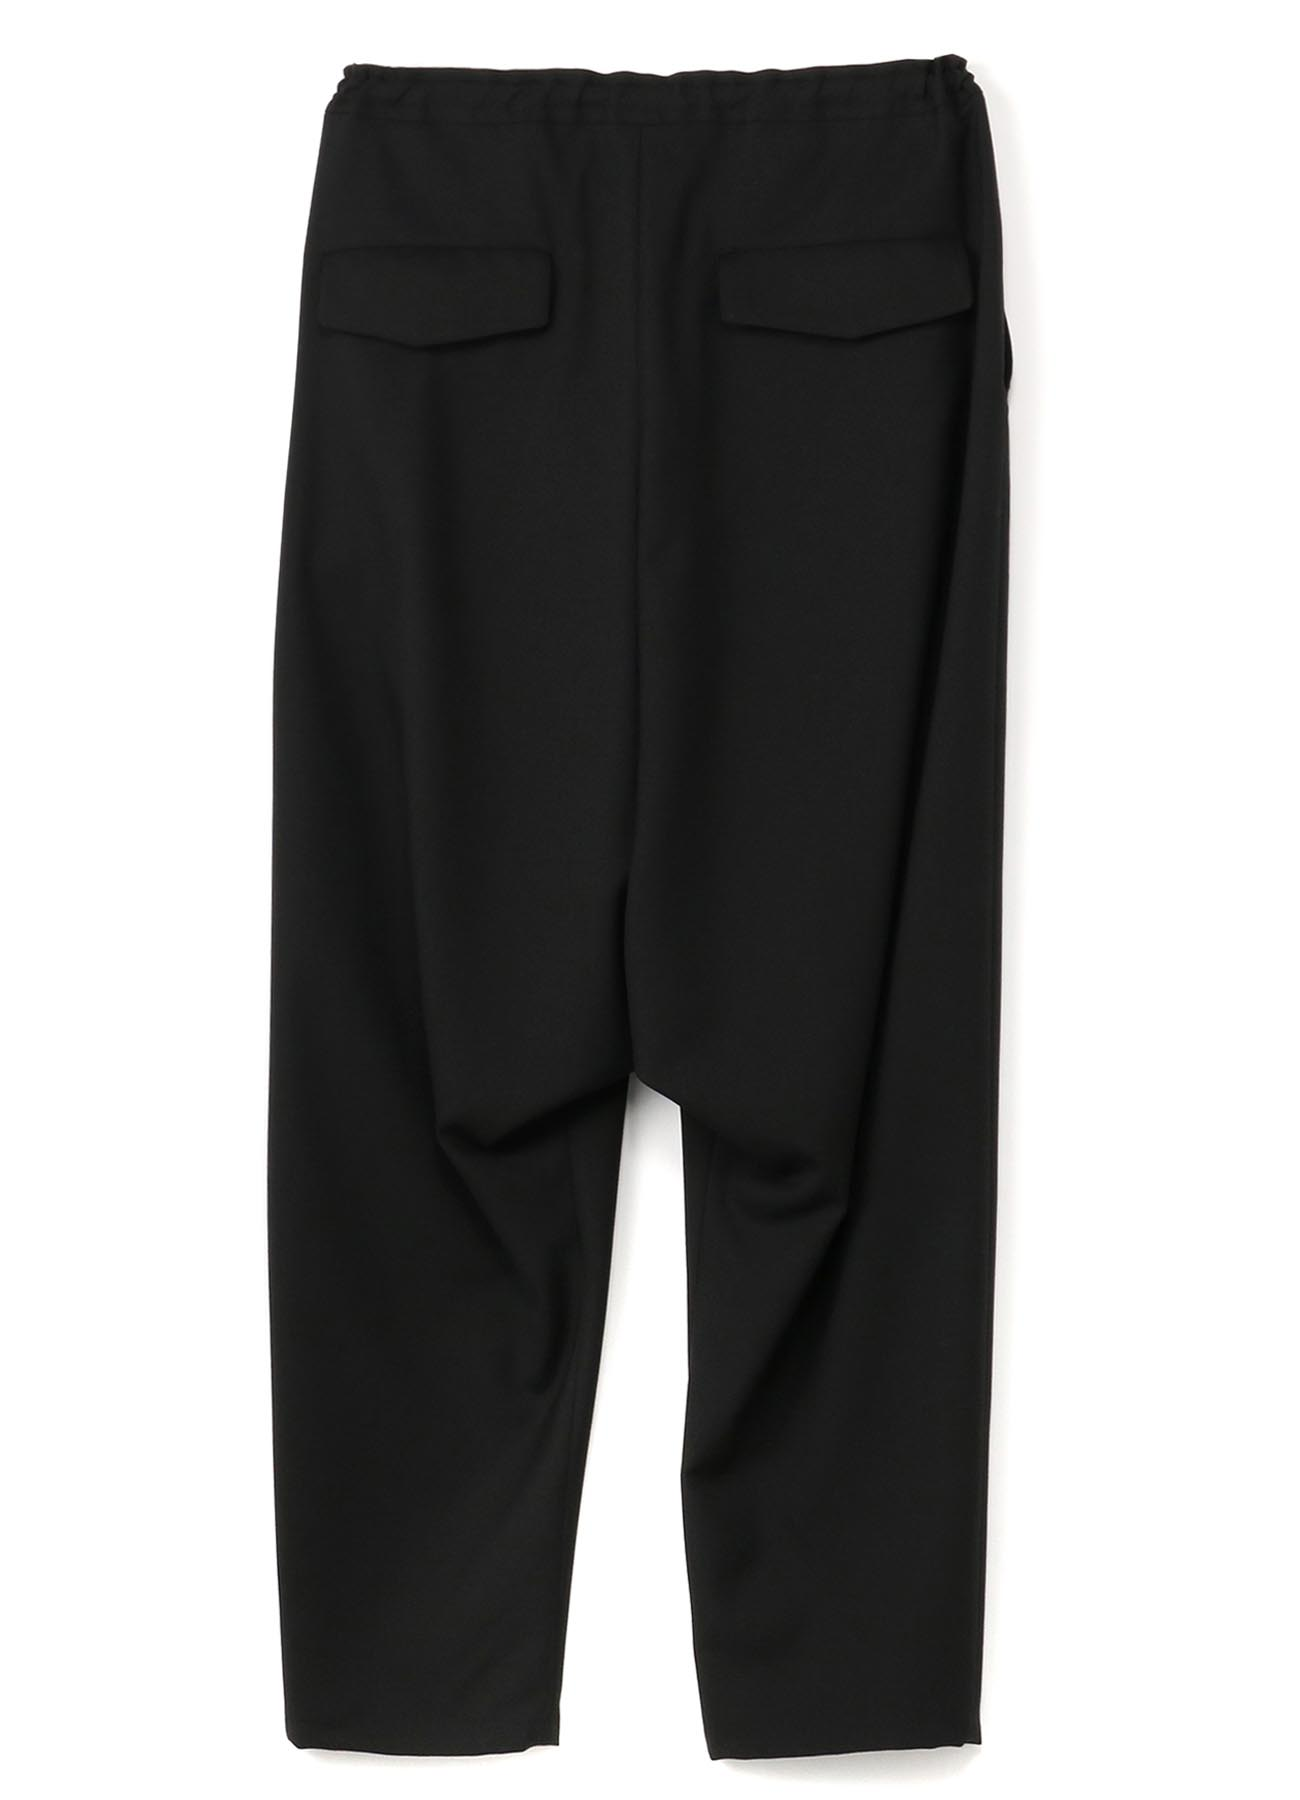 T/W Gabardine Sarouel Straight Pants